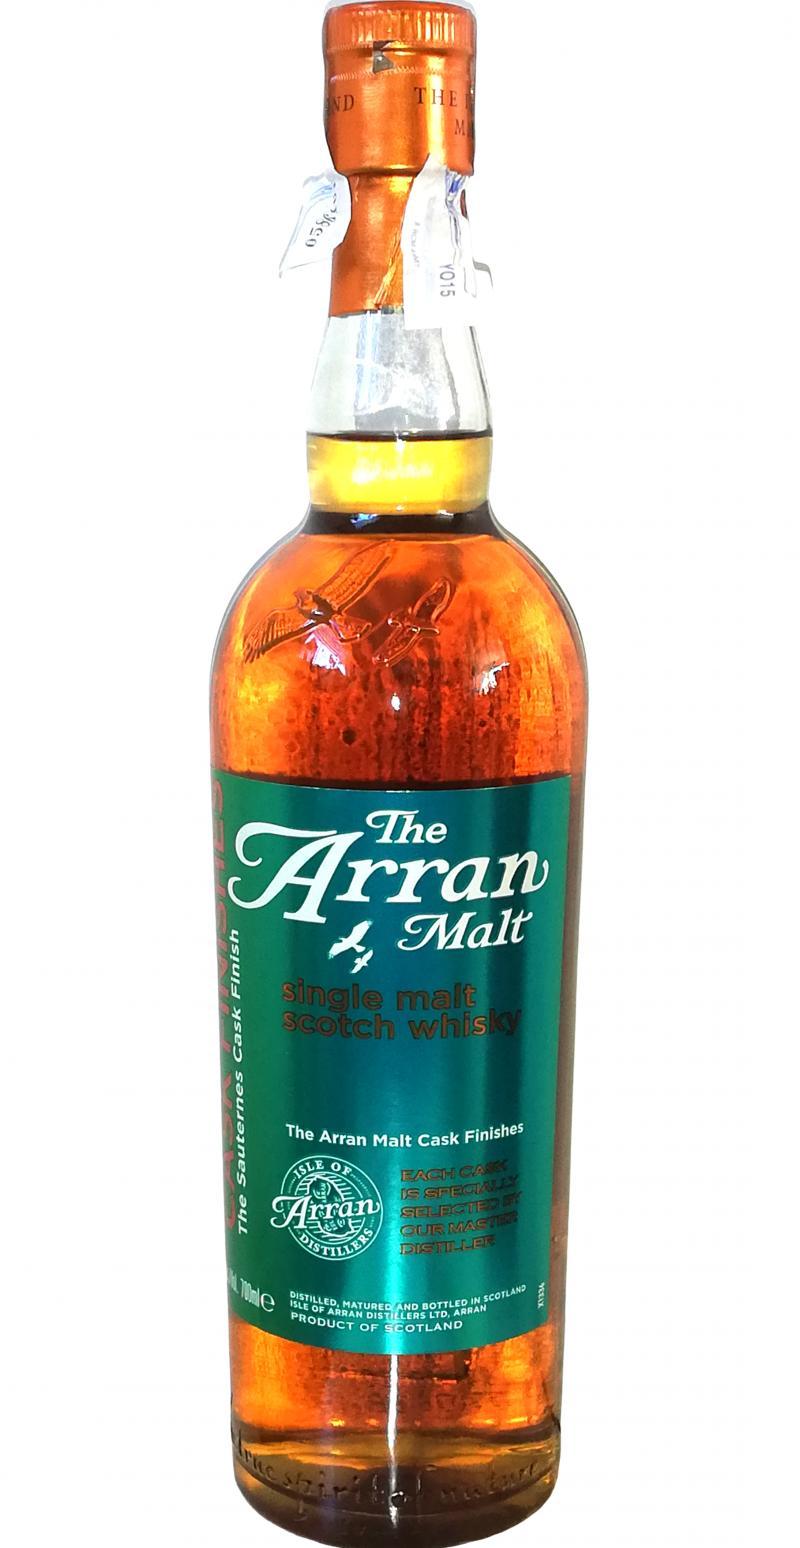 Arran 09-year-old